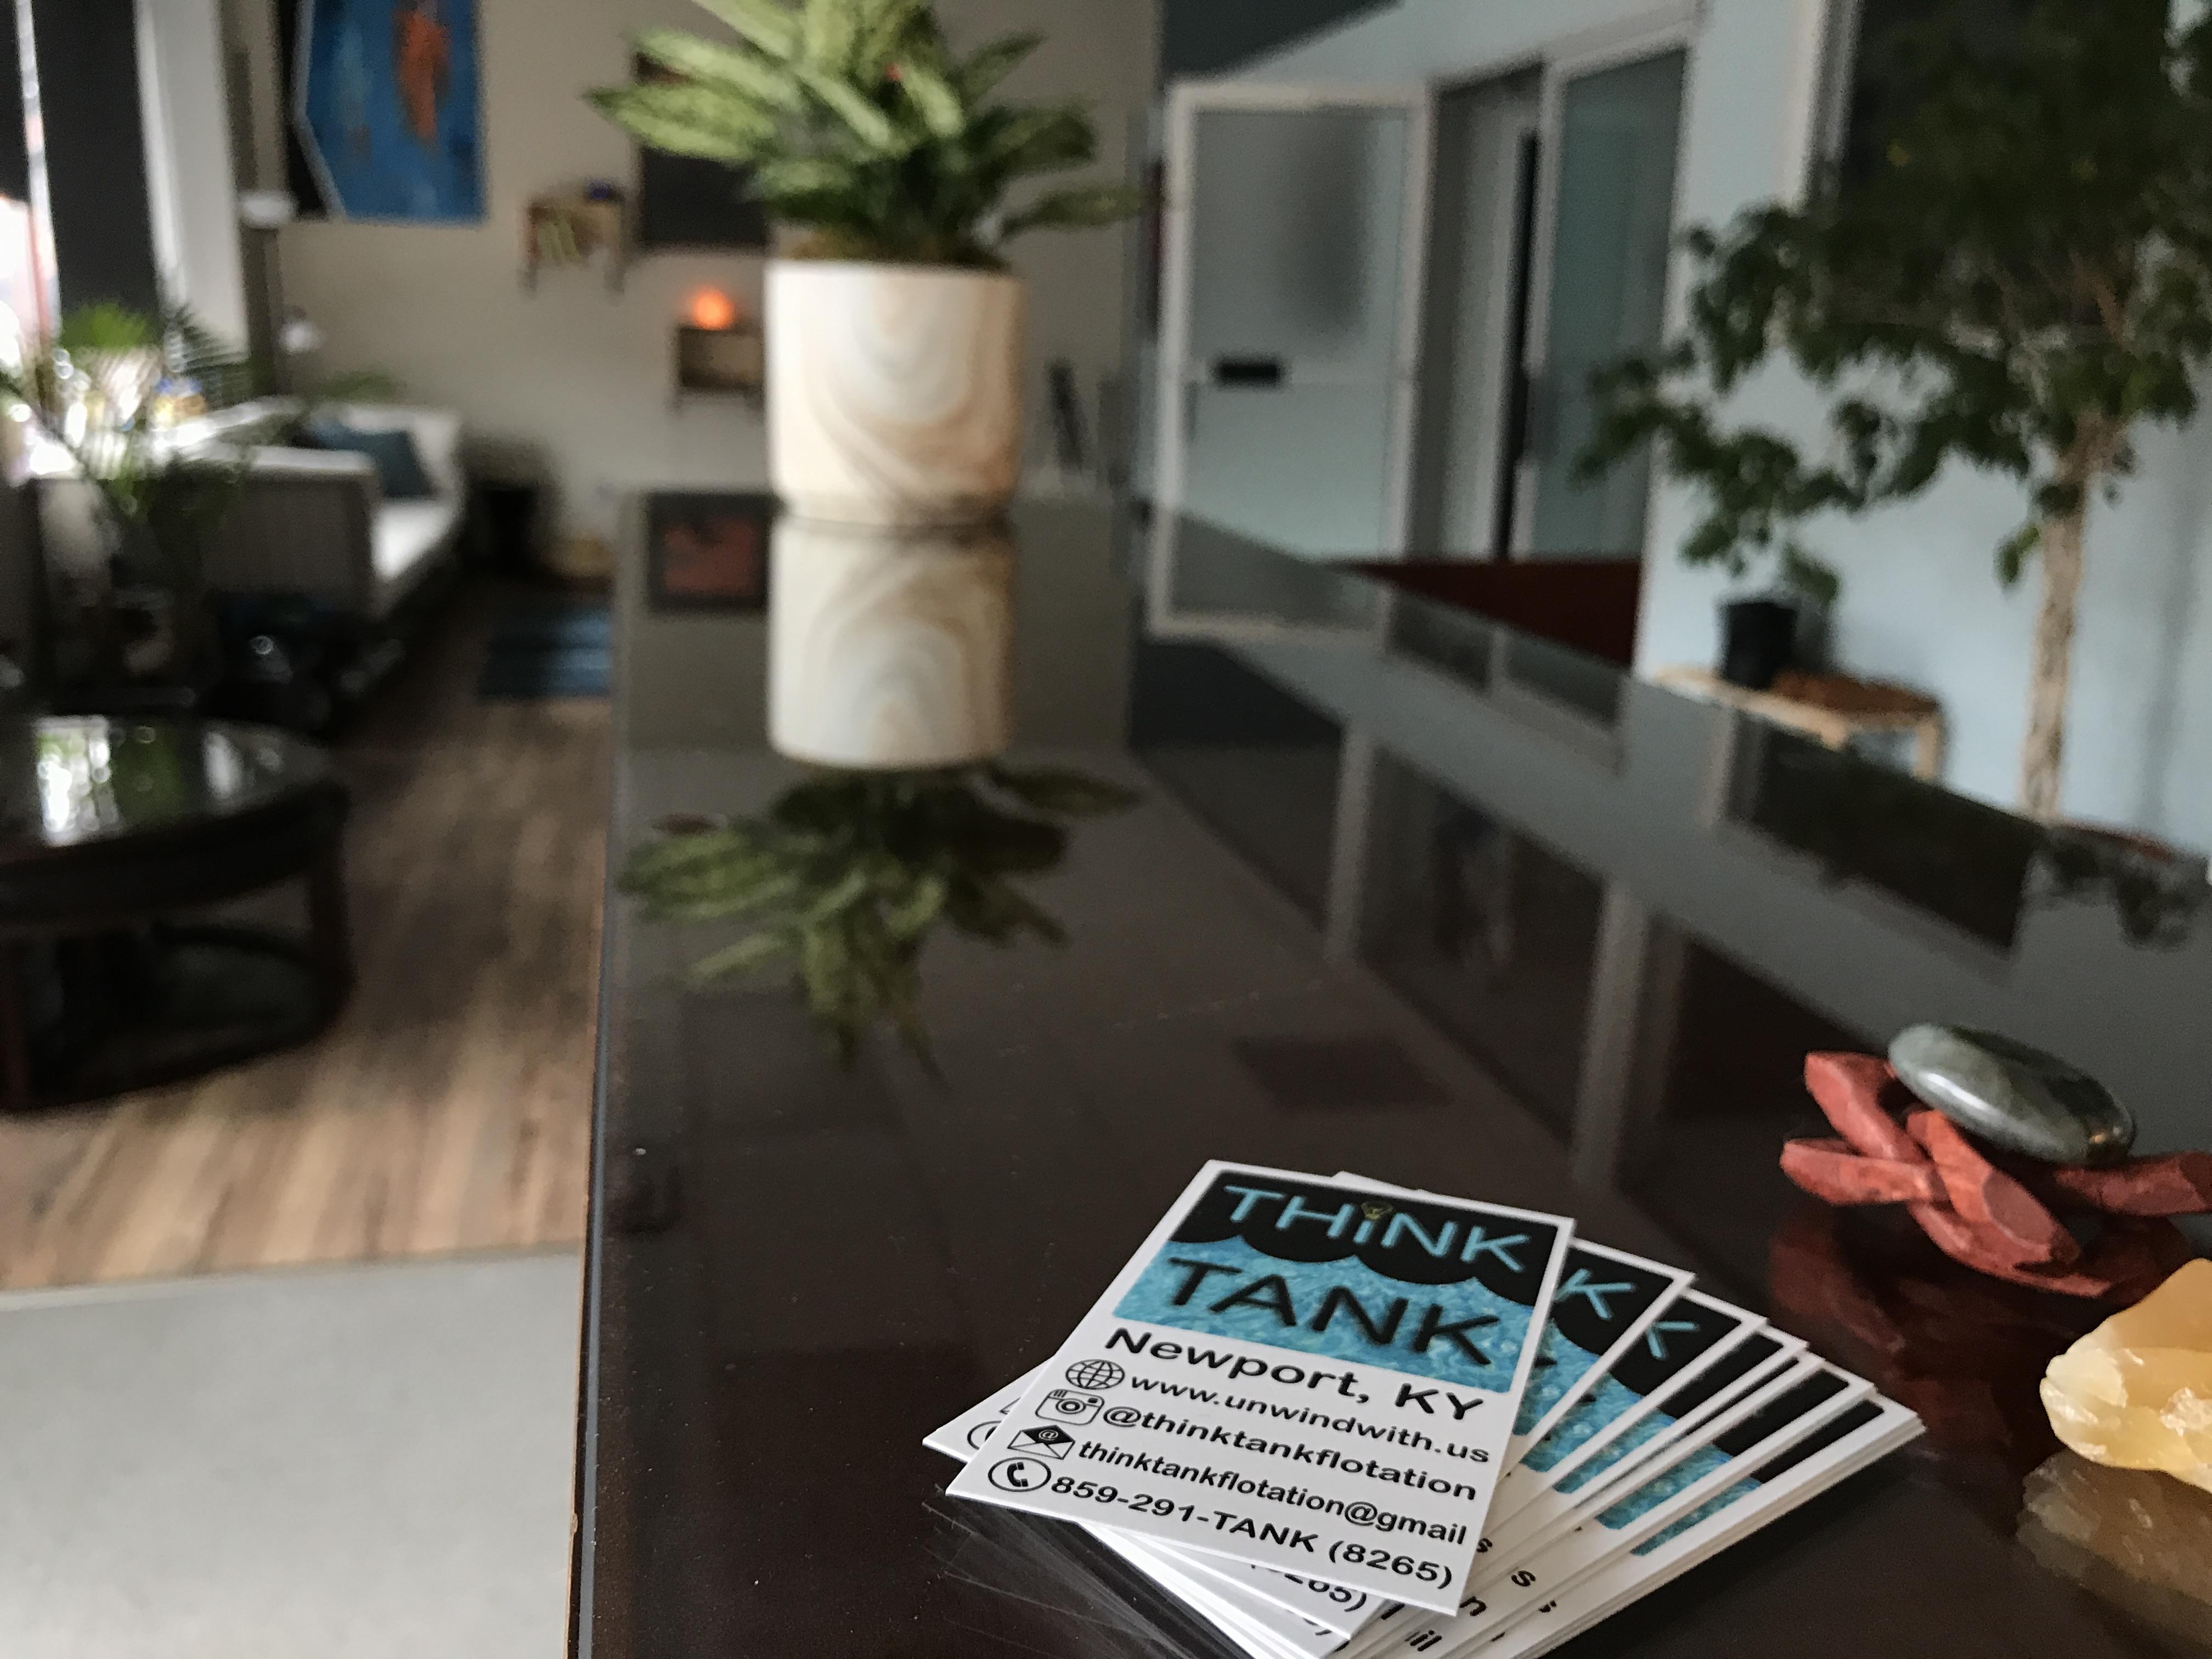 Think Tank, Cincinnati's top float therapy